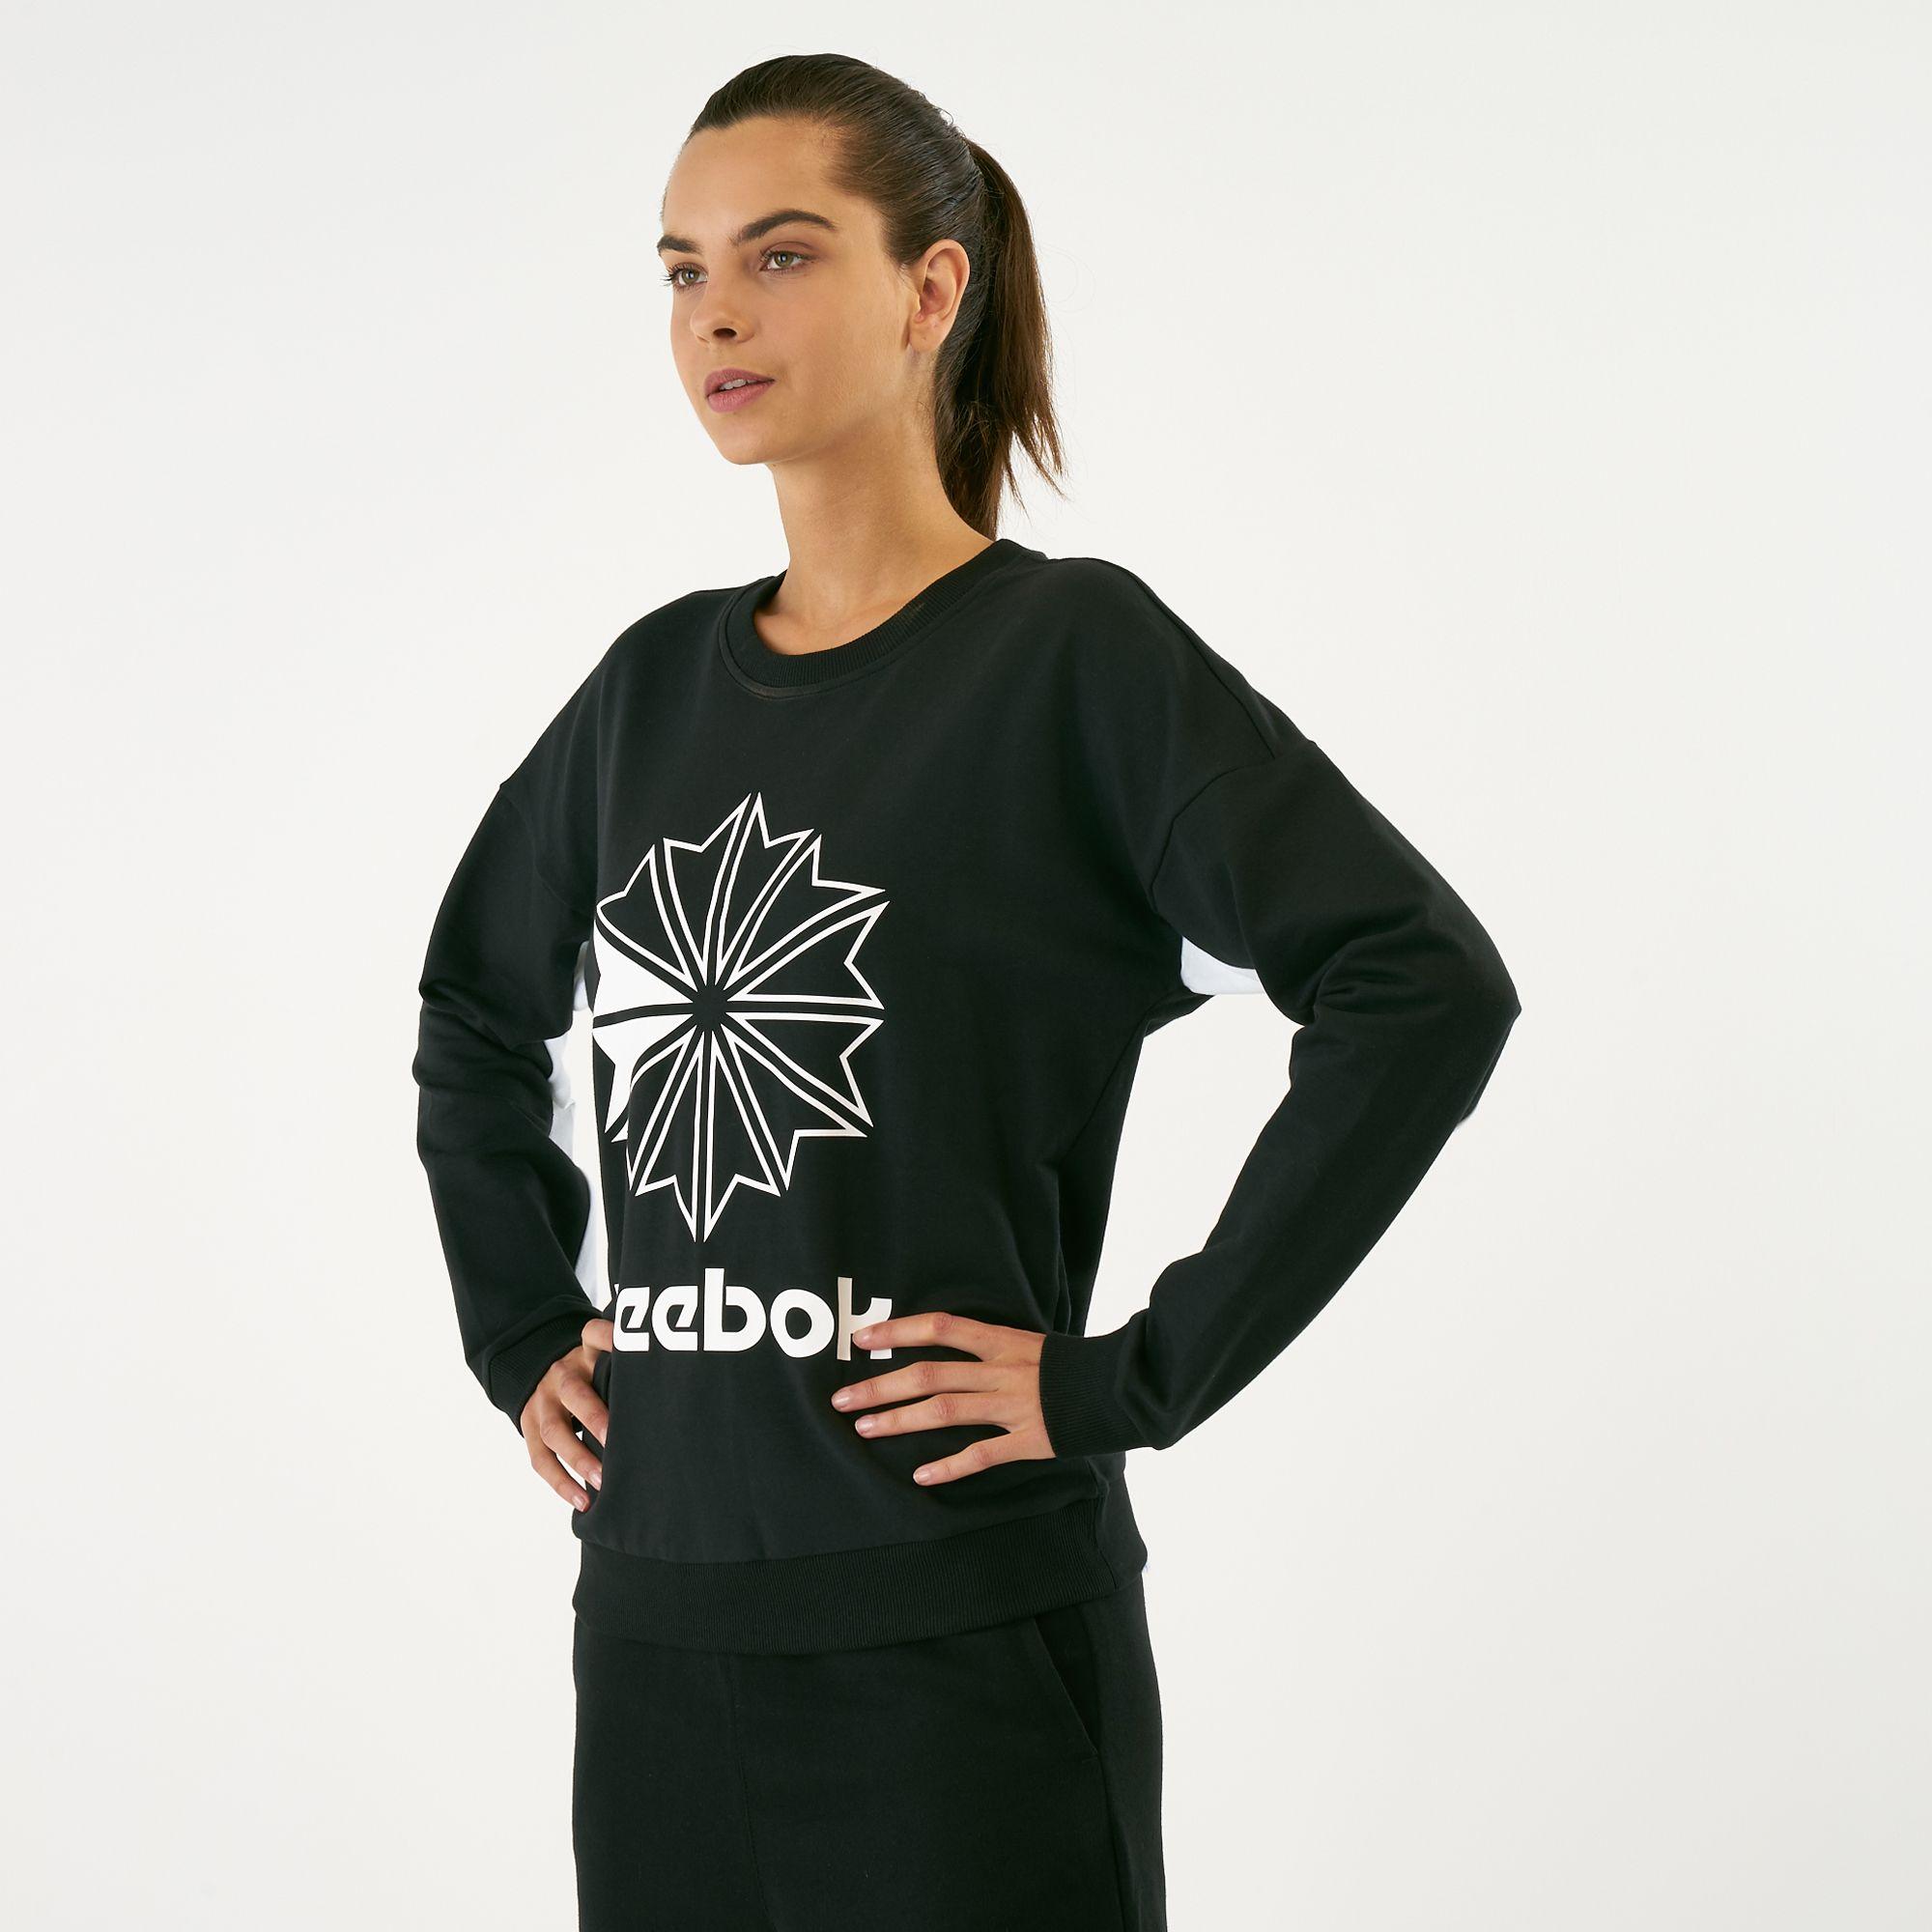 a43965f77d274 Reebok Women's French Terry Classics Big Logo Crew Sweatshirt ...